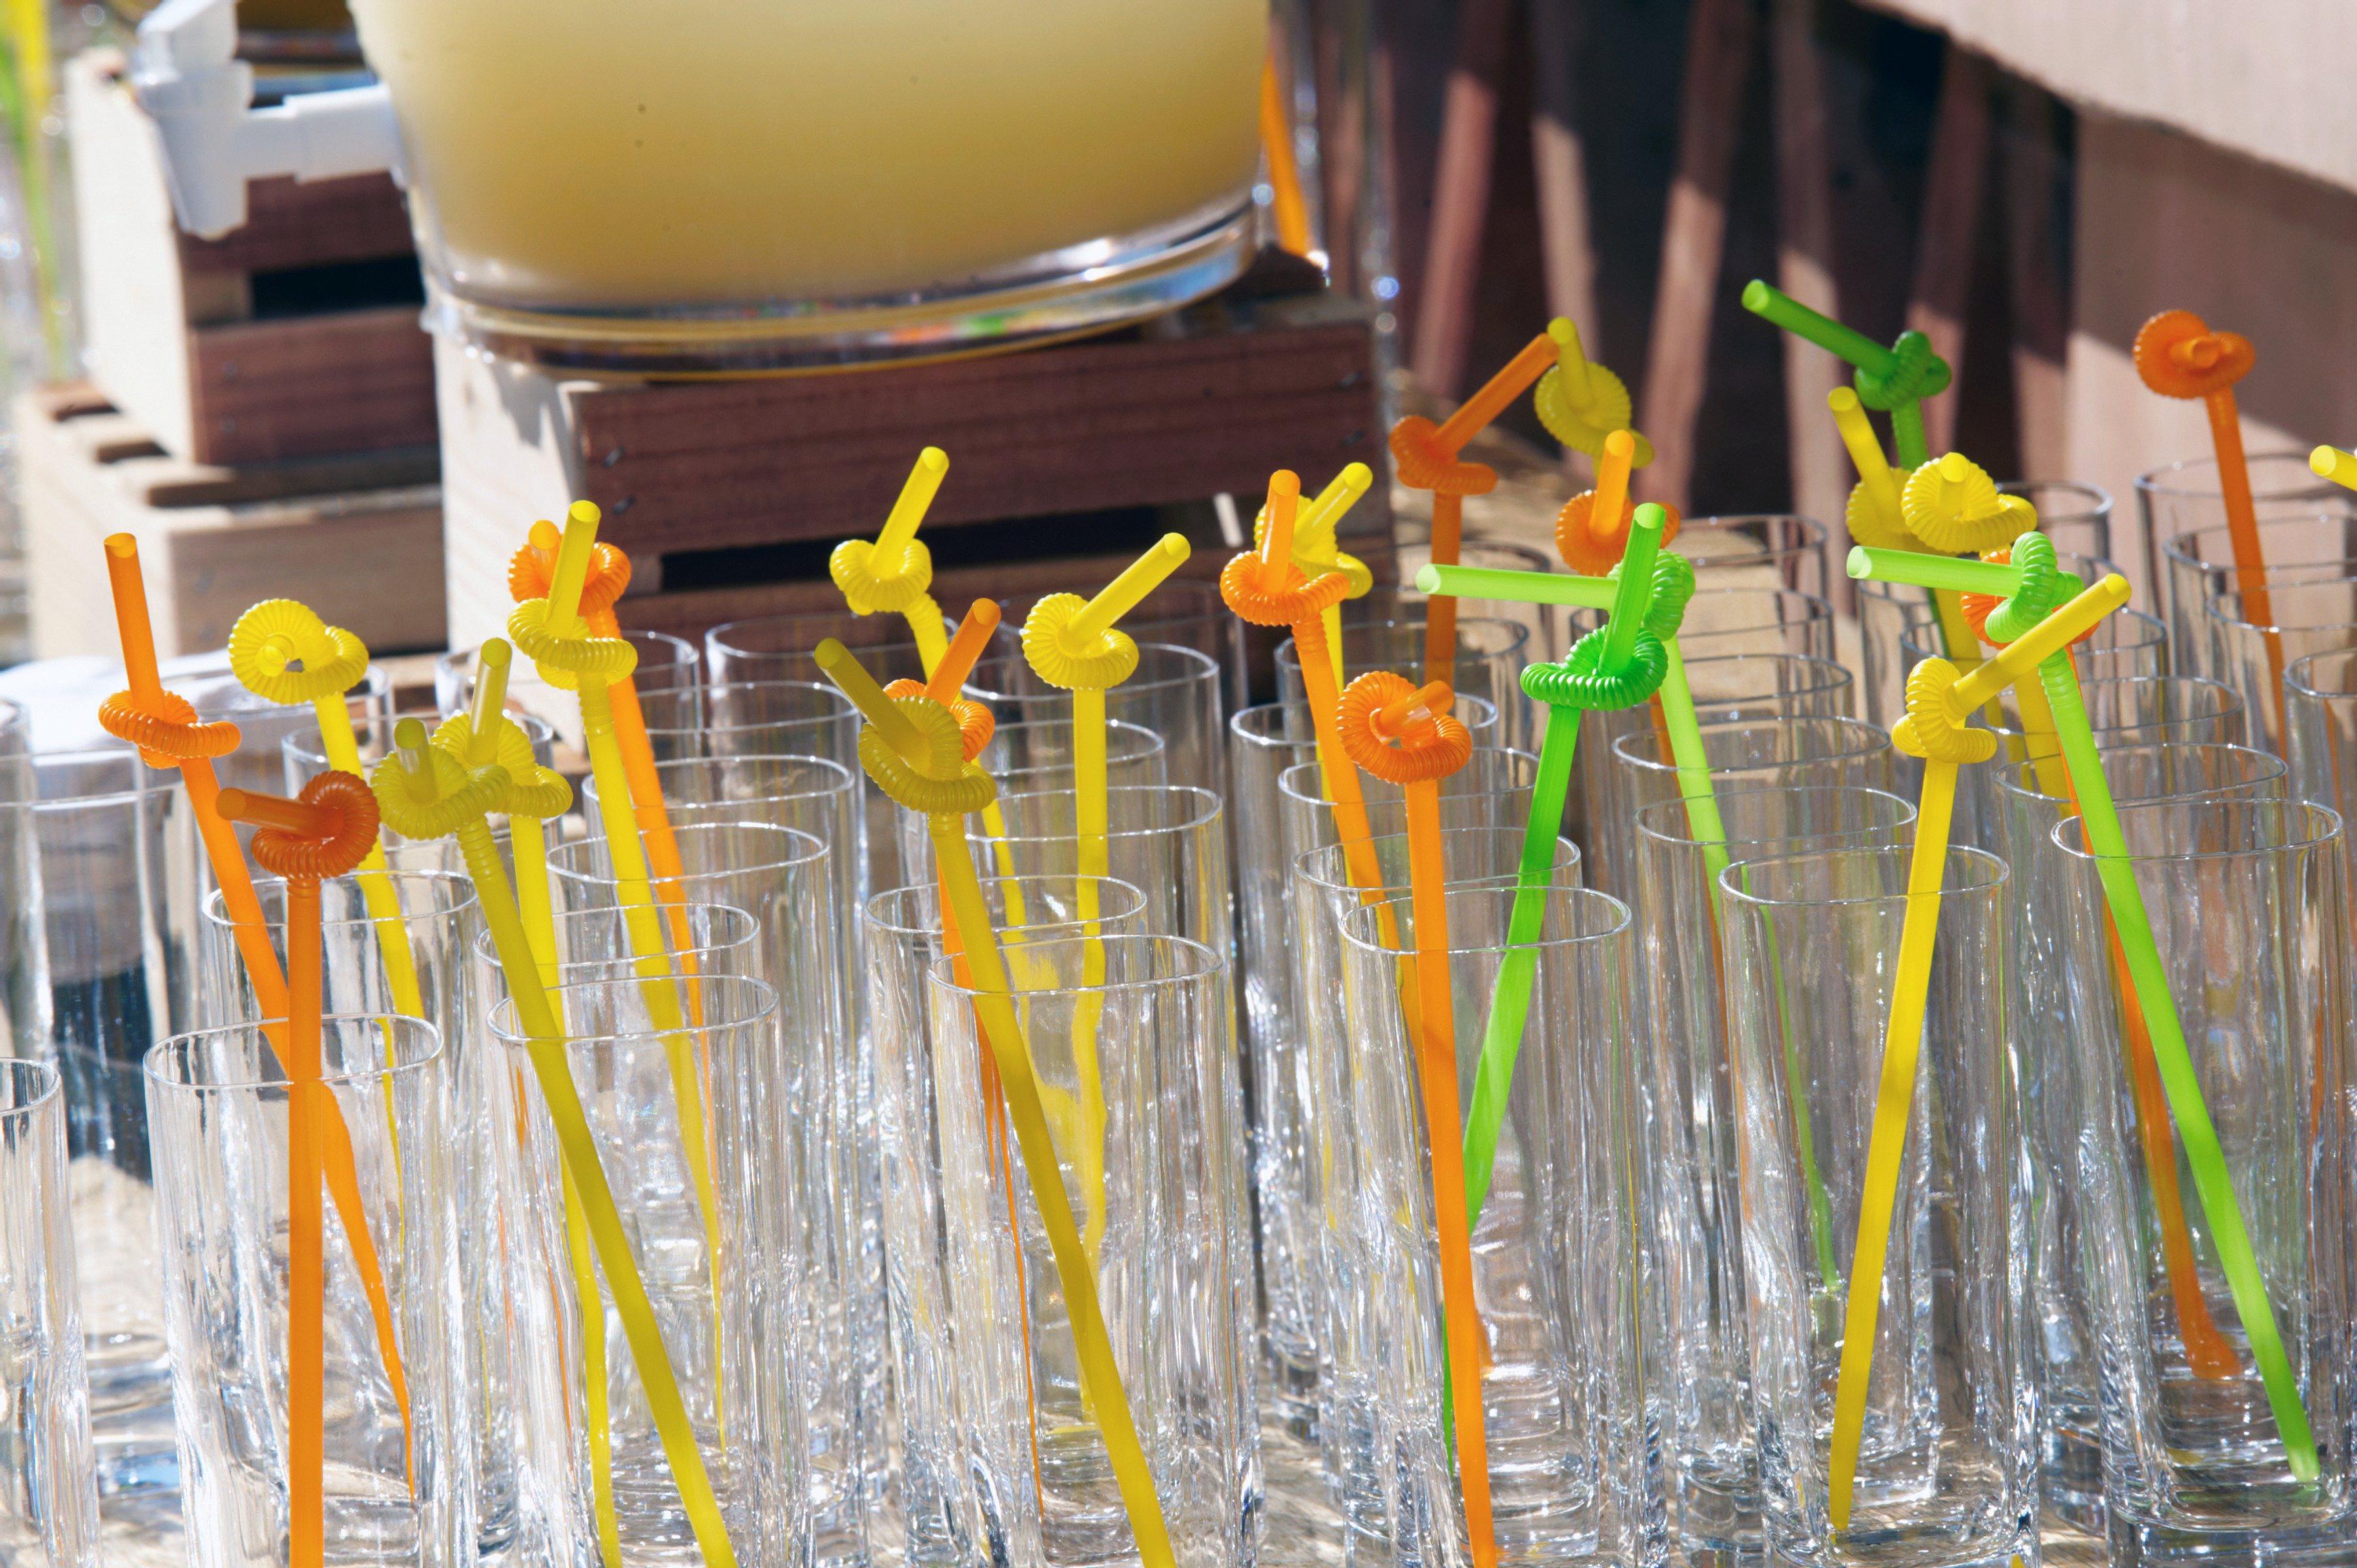 Swirly fun straws at wedding reception